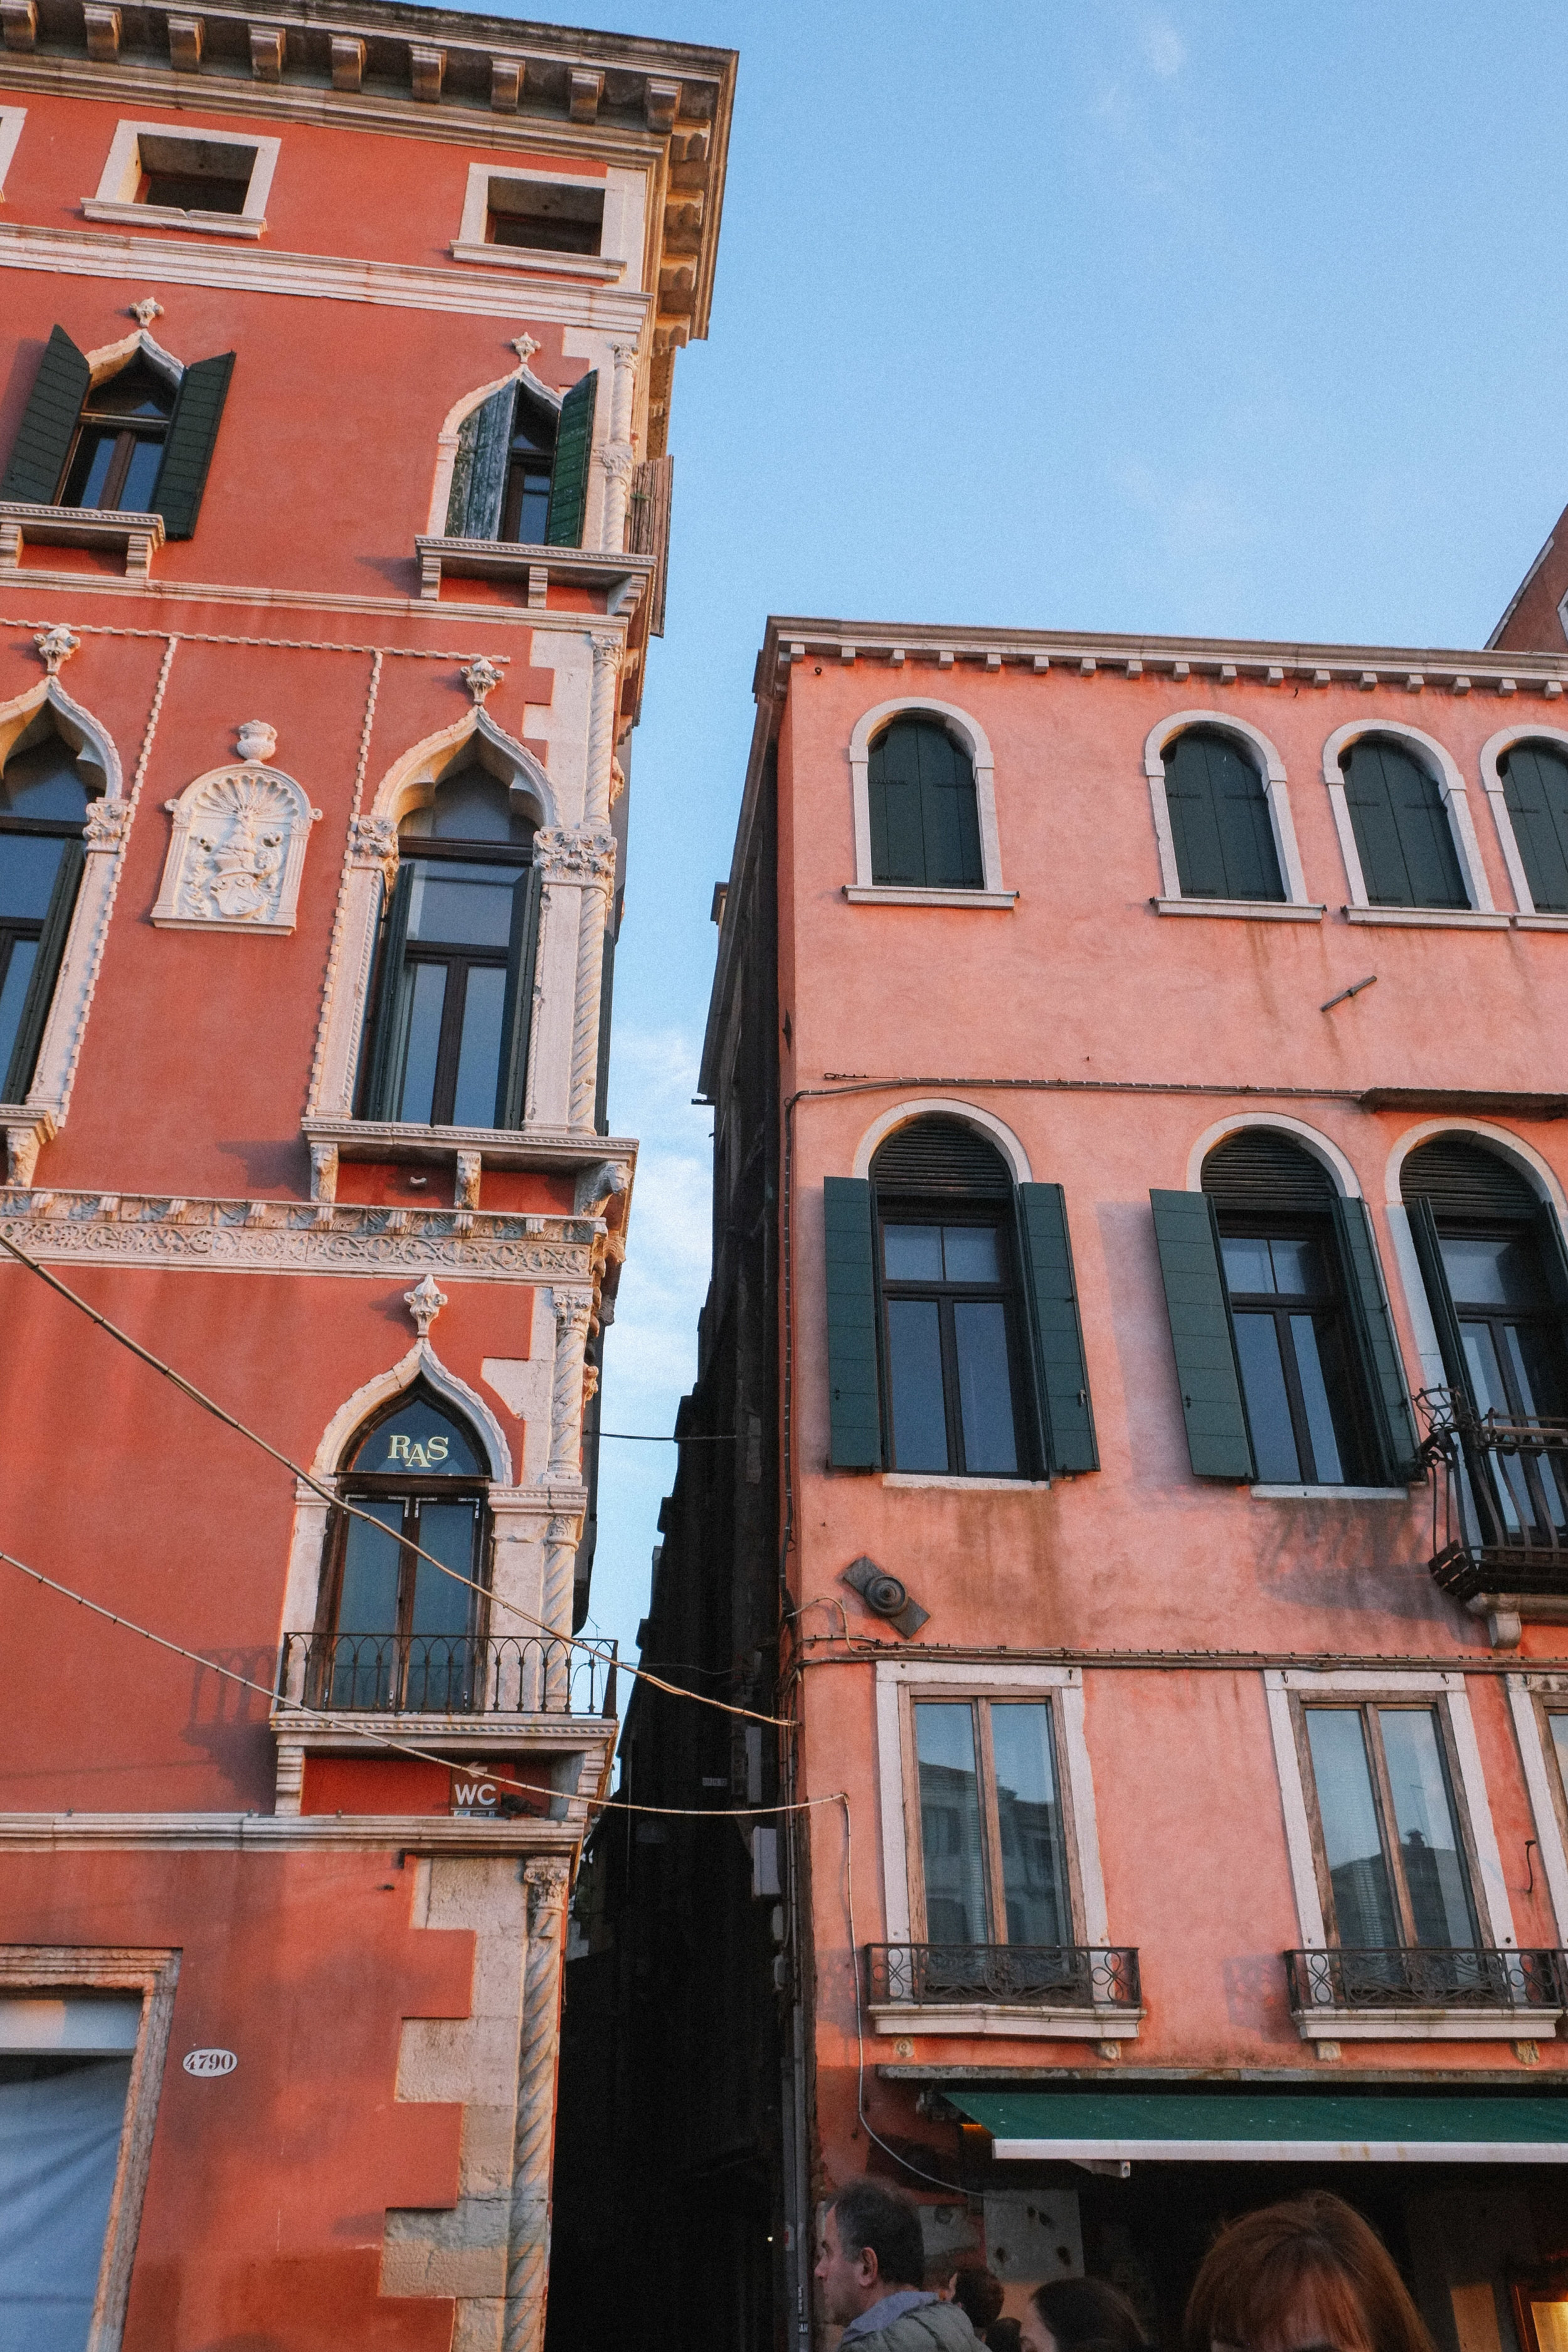 Lesly Lotha_Venice_Italy 07.jpg